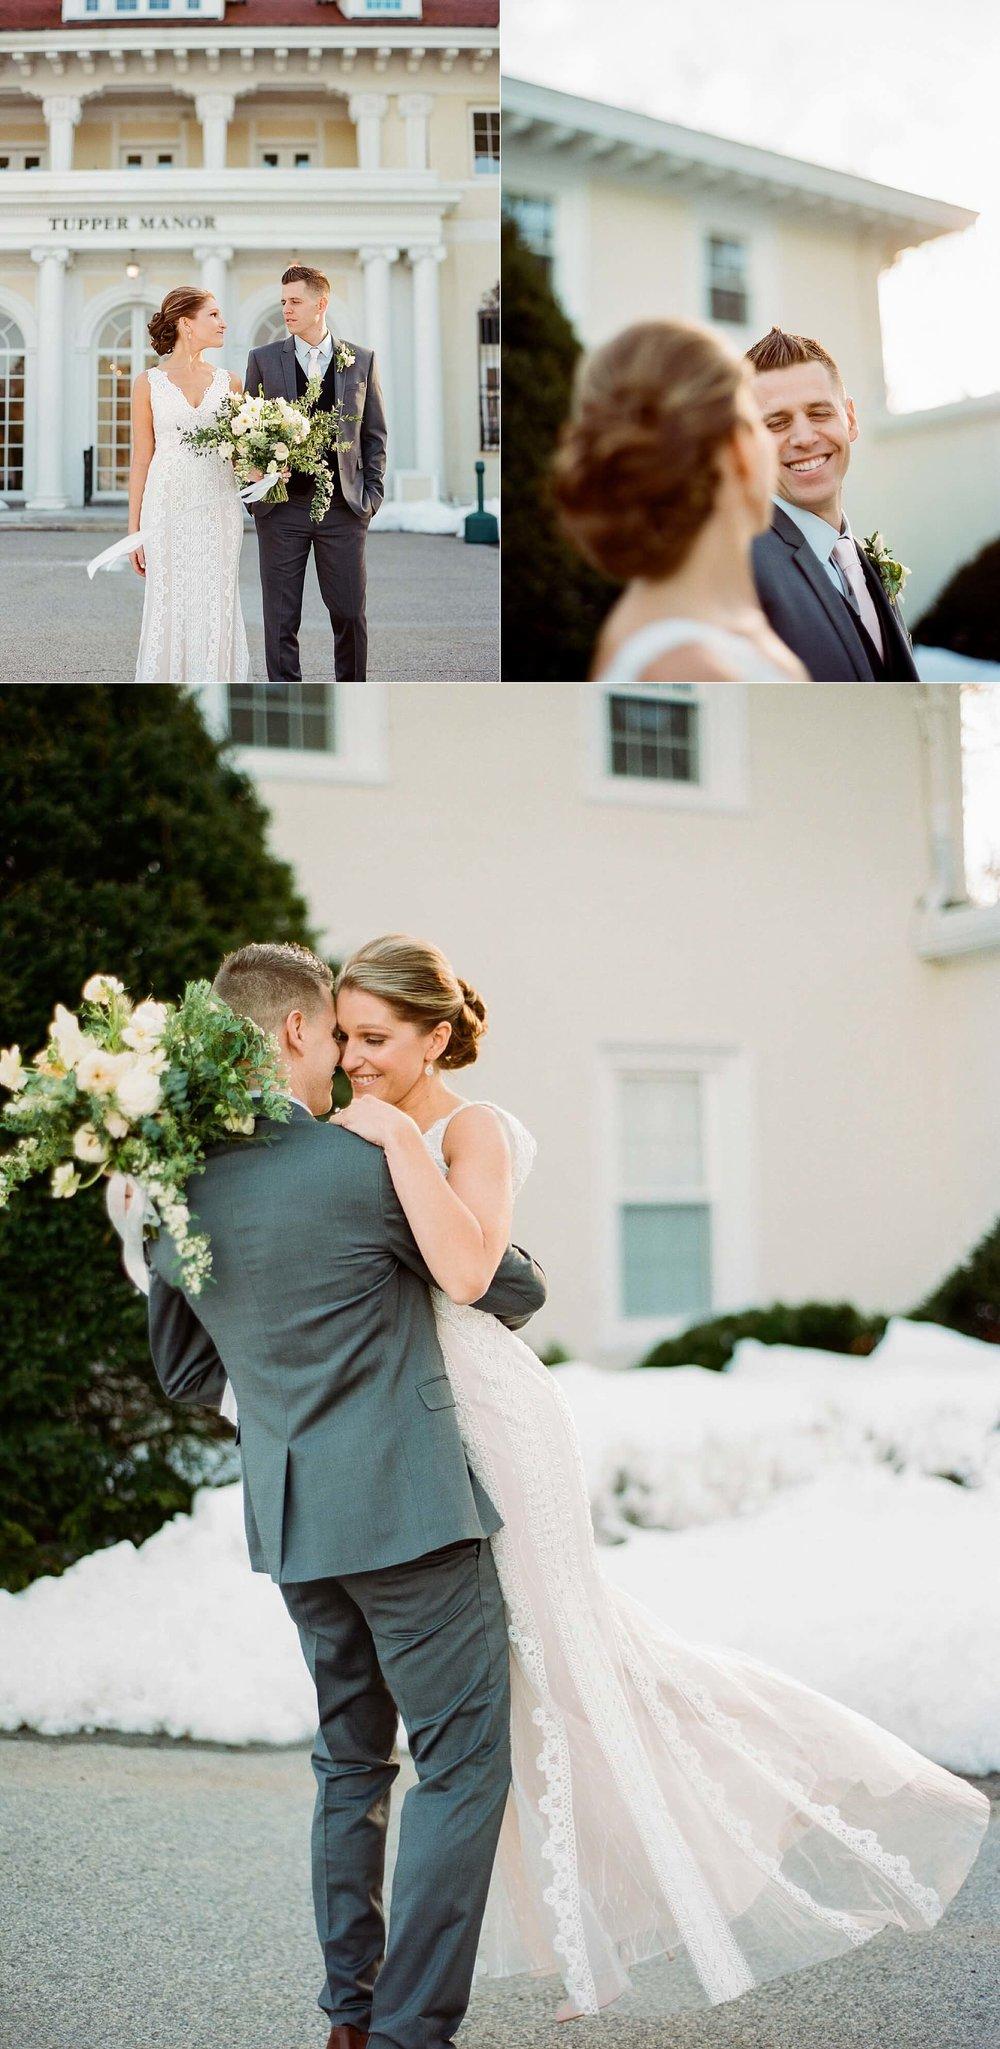 Tupper Manor Wedding_0006.jpg